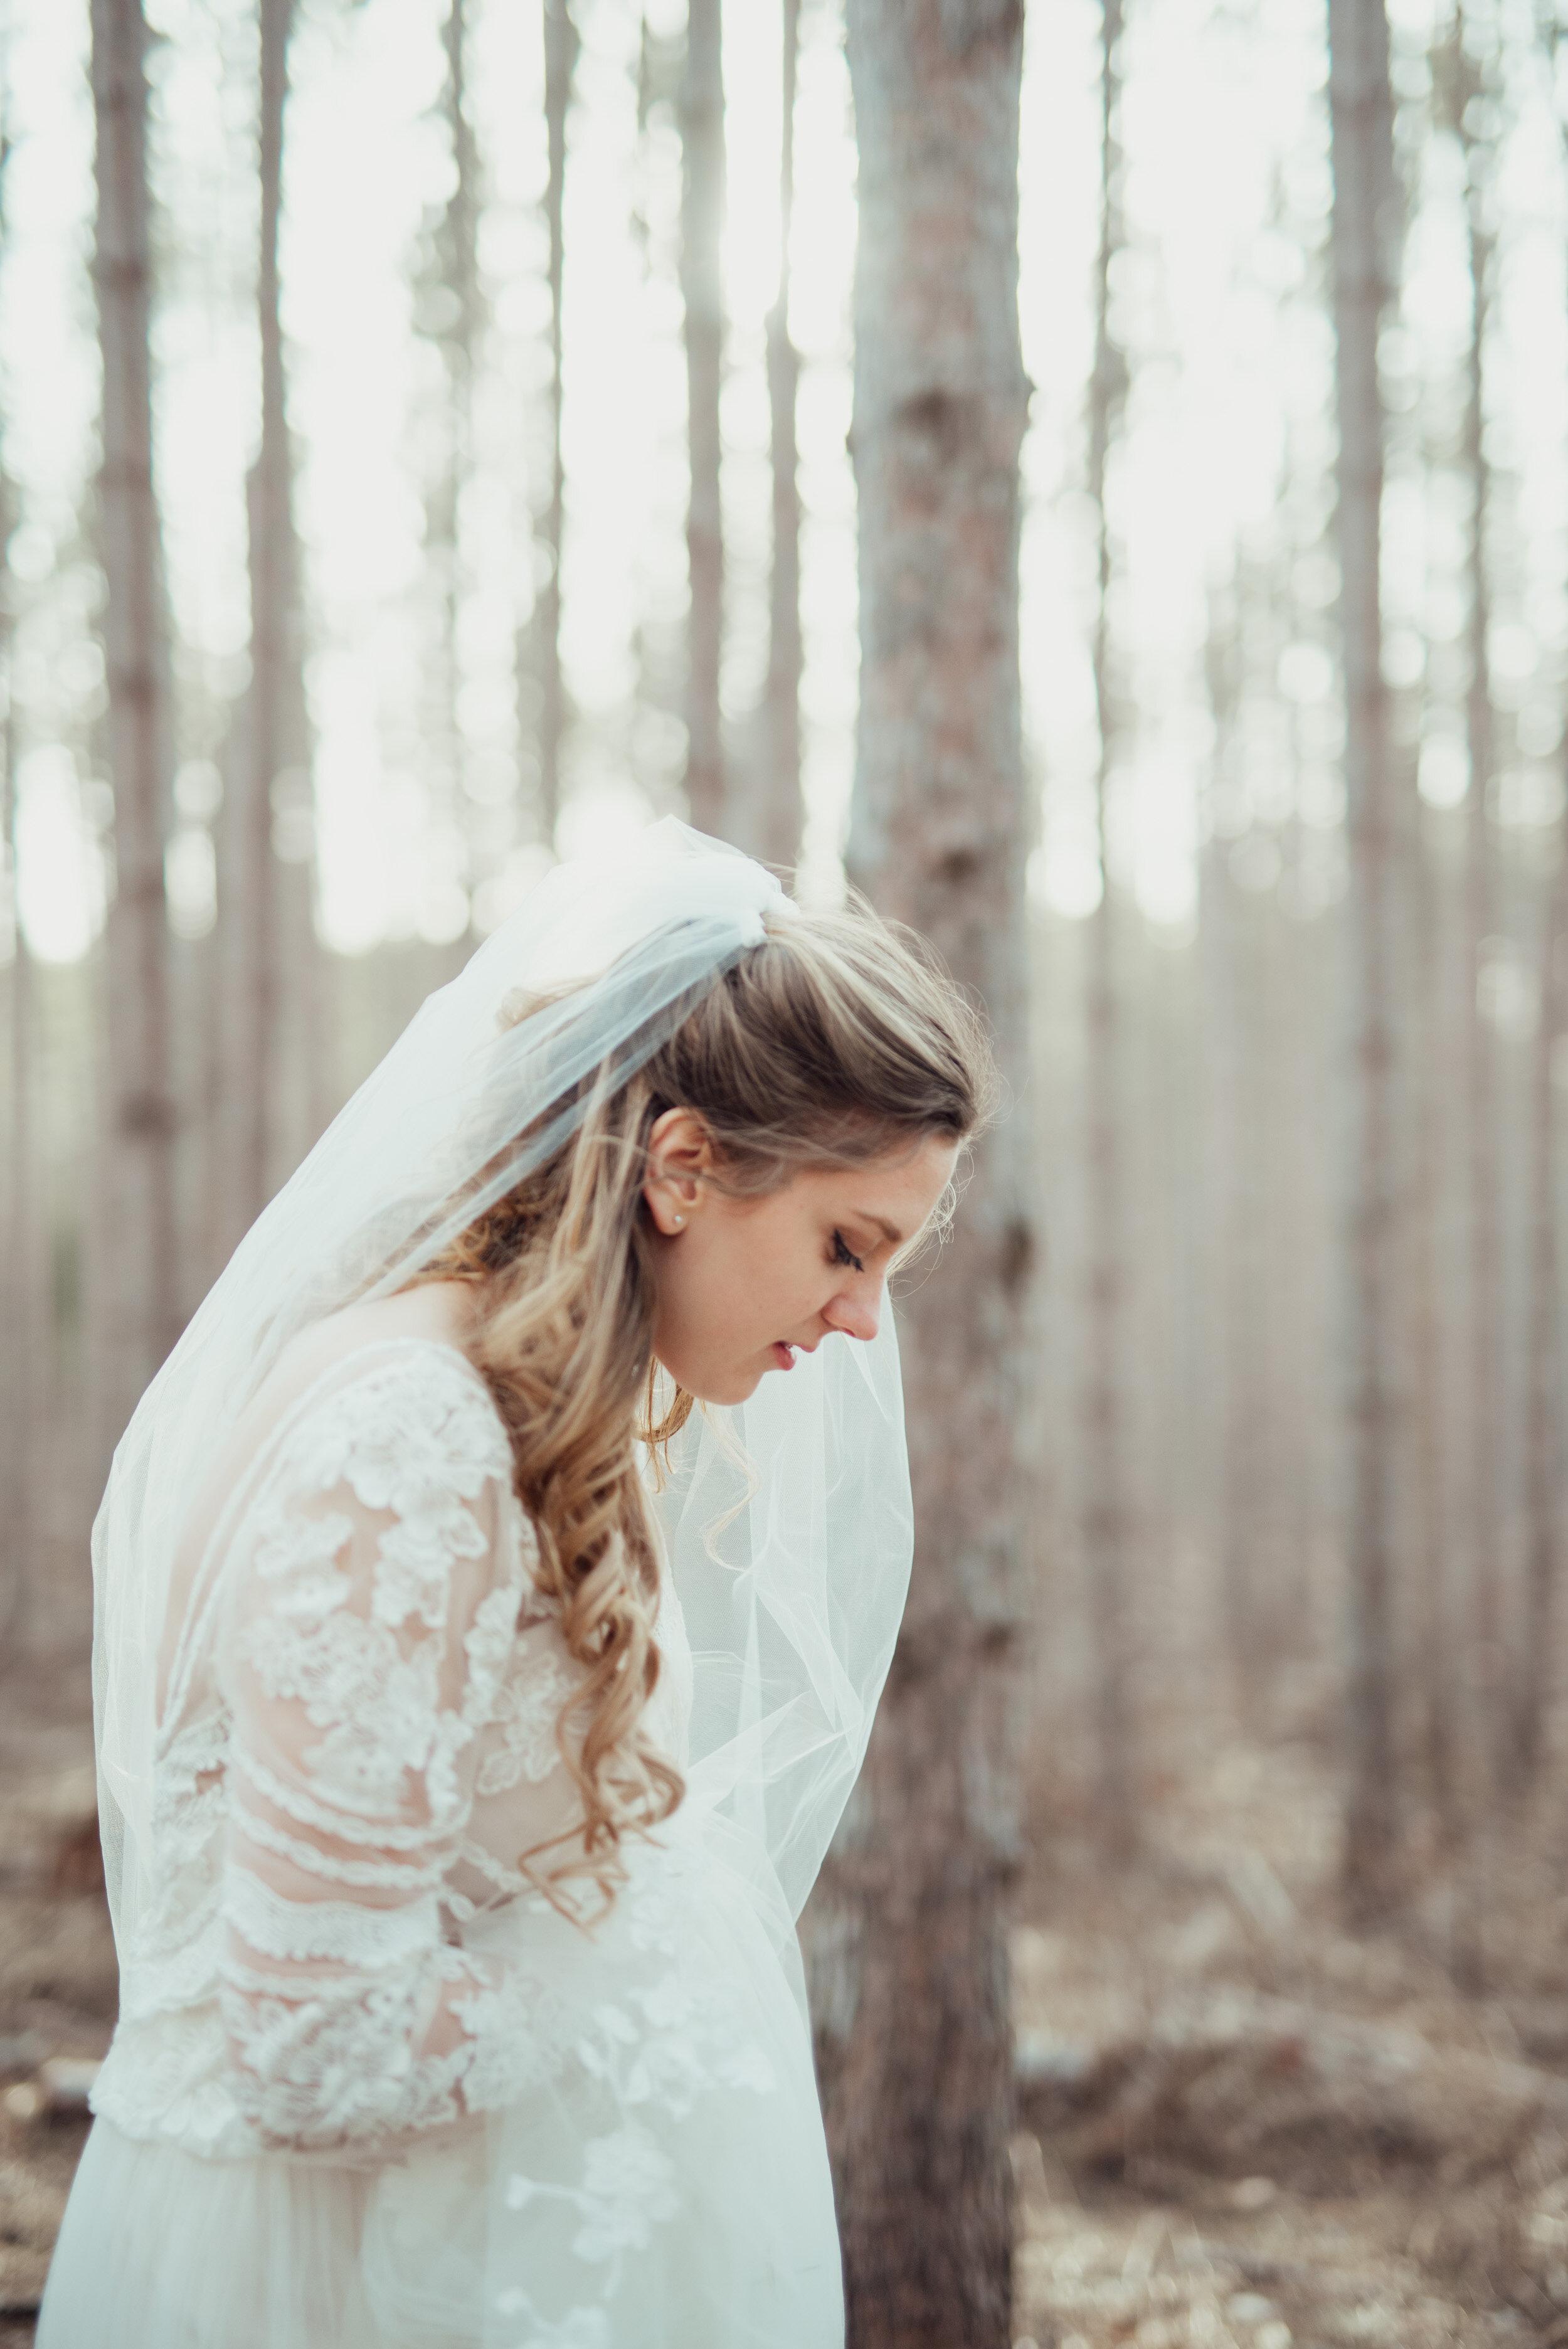 cleland-fine-art-wedding-photography-12.jpg